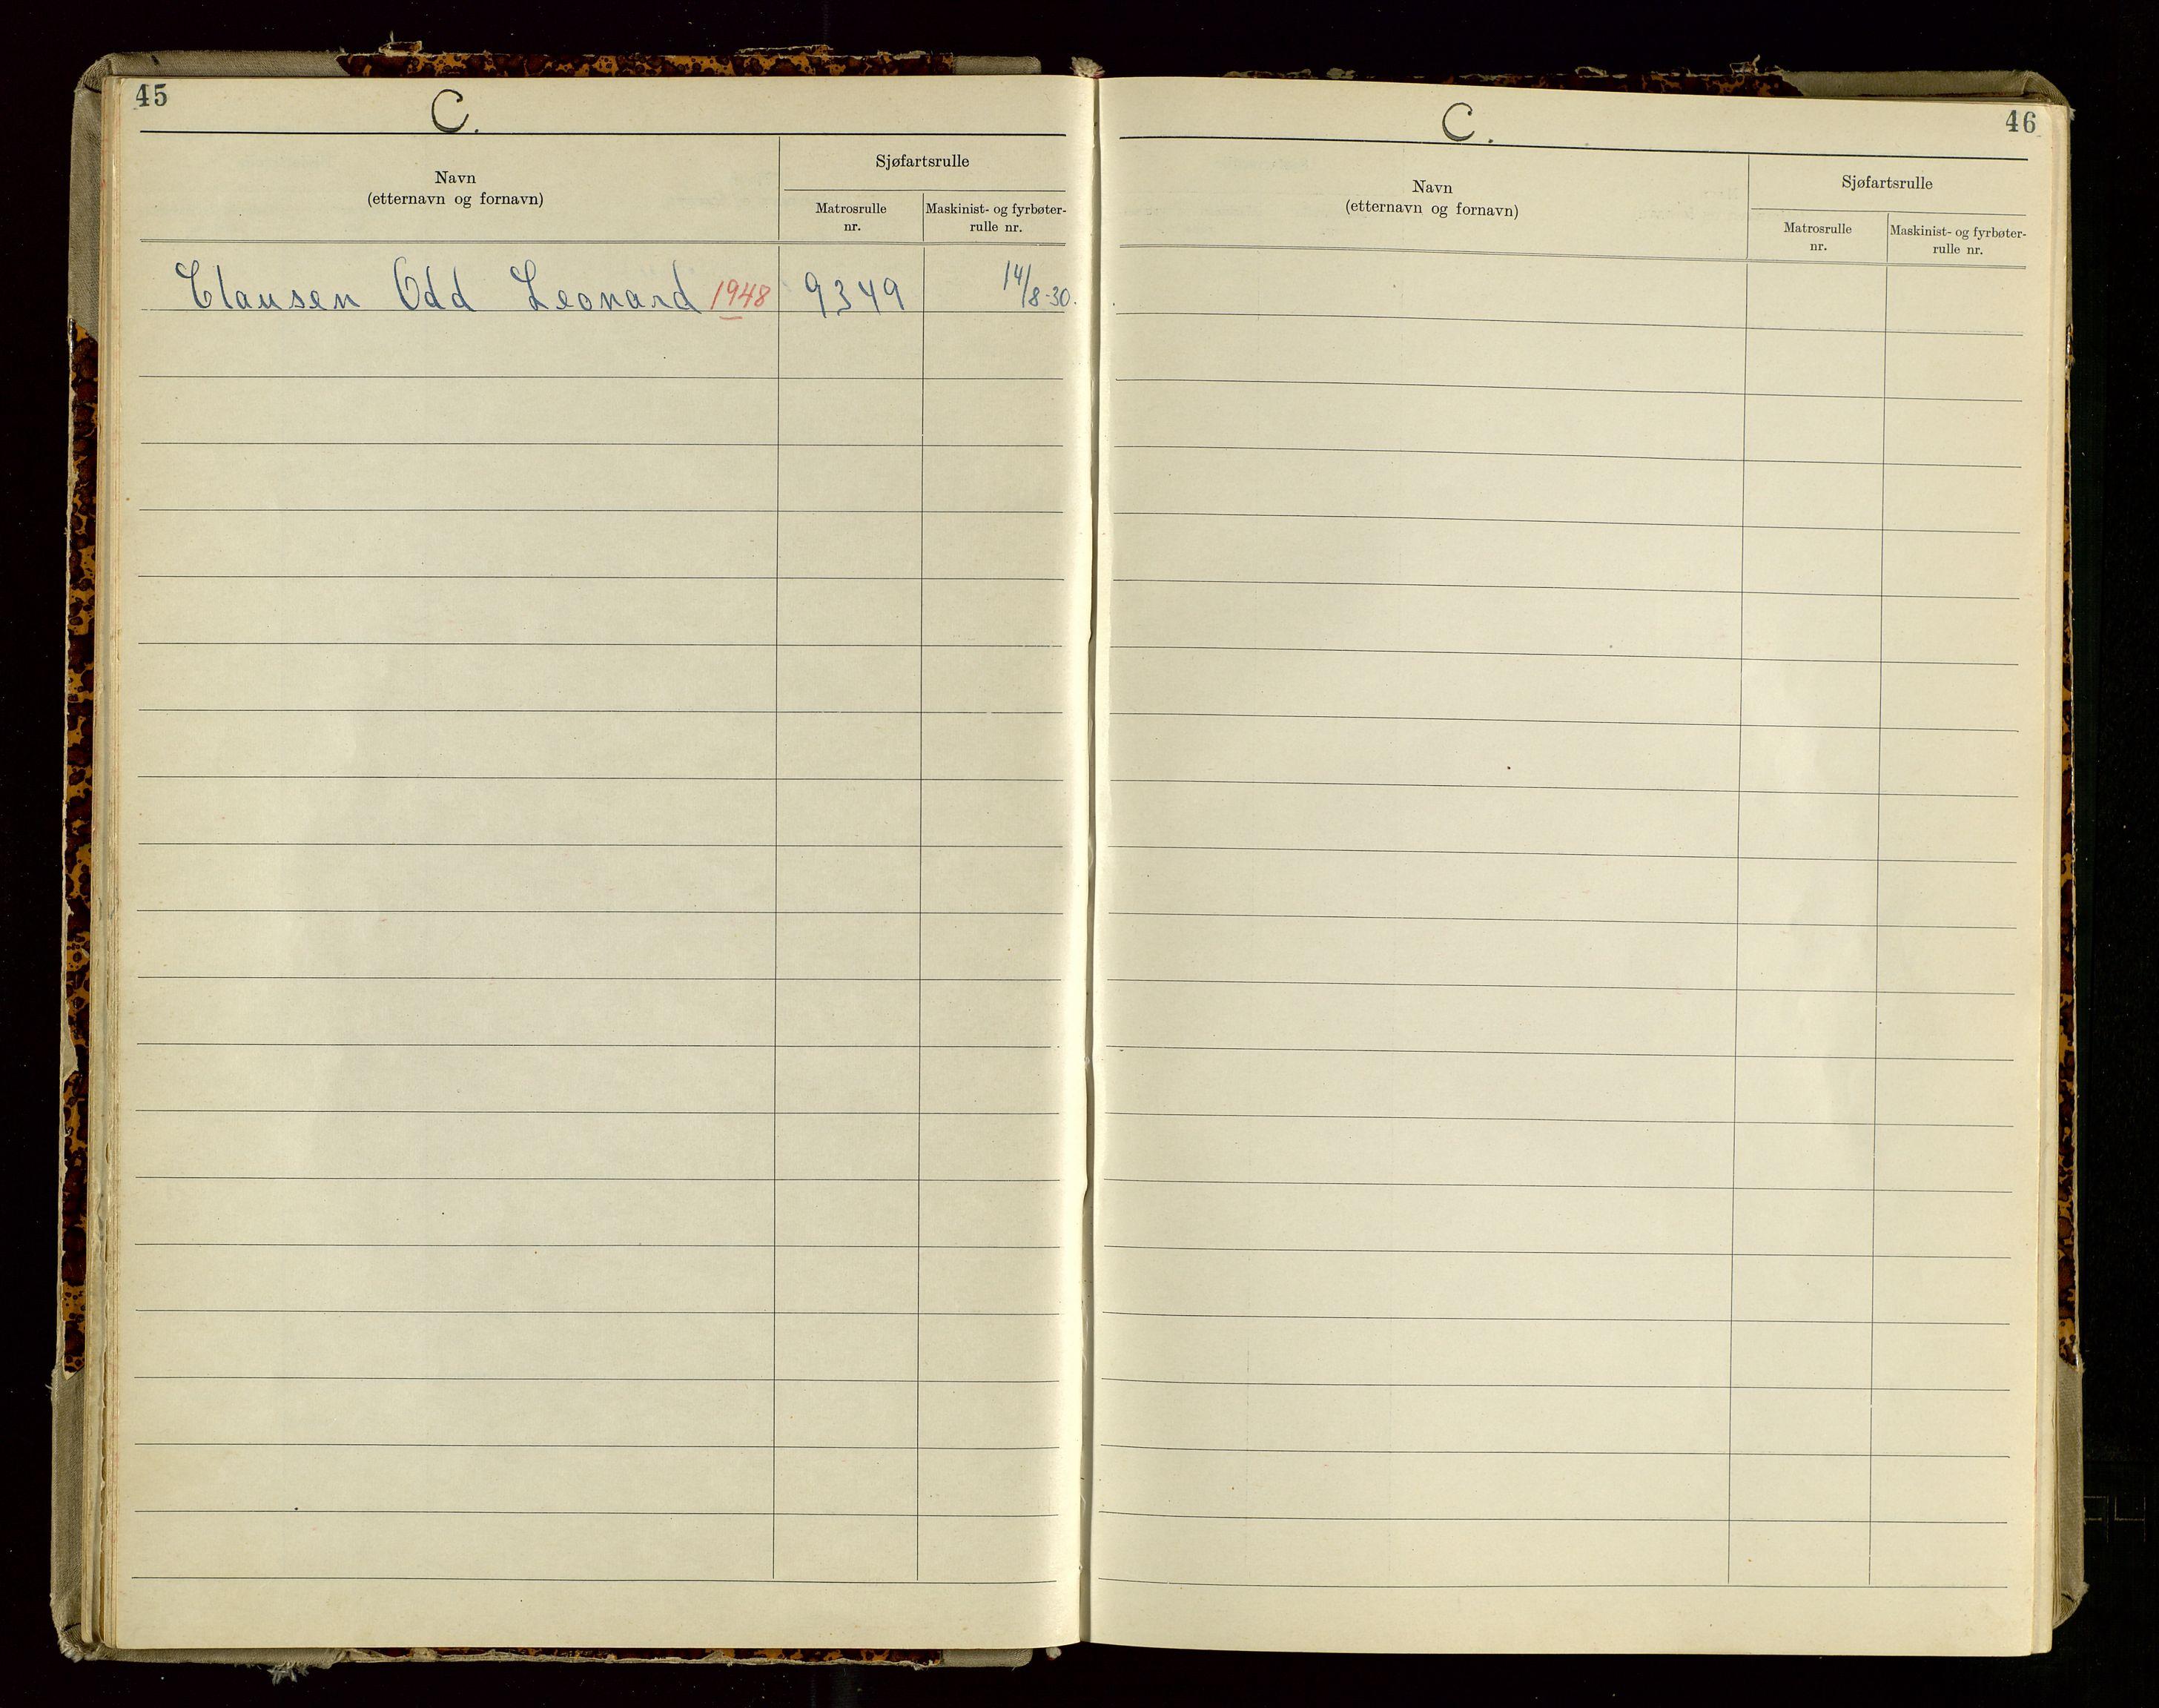 SAST, Haugesund sjømannskontor, F/Fb/Fba/L0007: Navneregister med henvisning til rullenummer (etternavn) Haugesund krets , 1944, s. 45